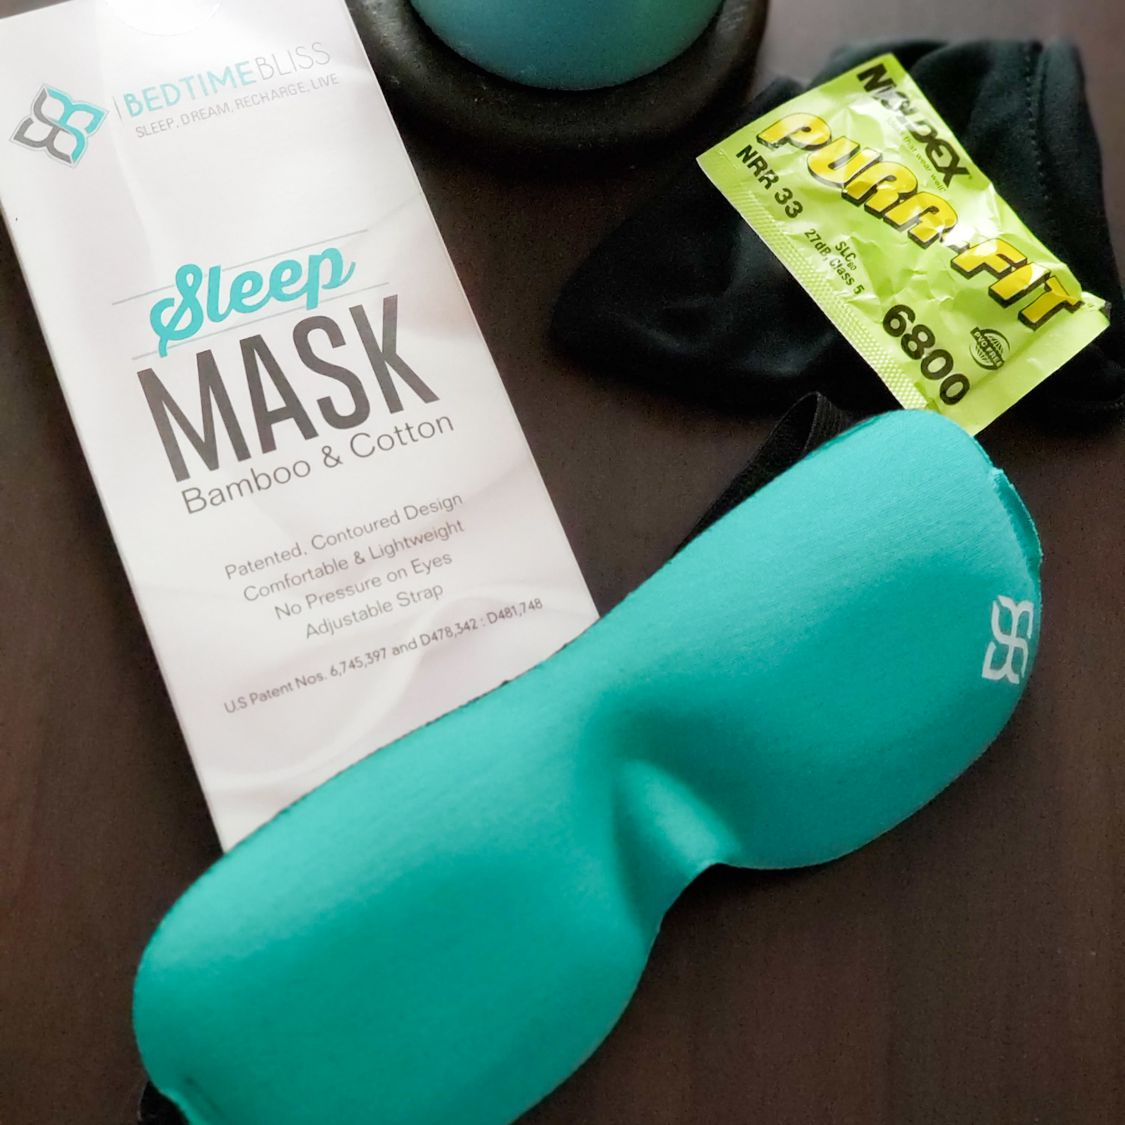 The 8 Best Sleep Masks of 2019